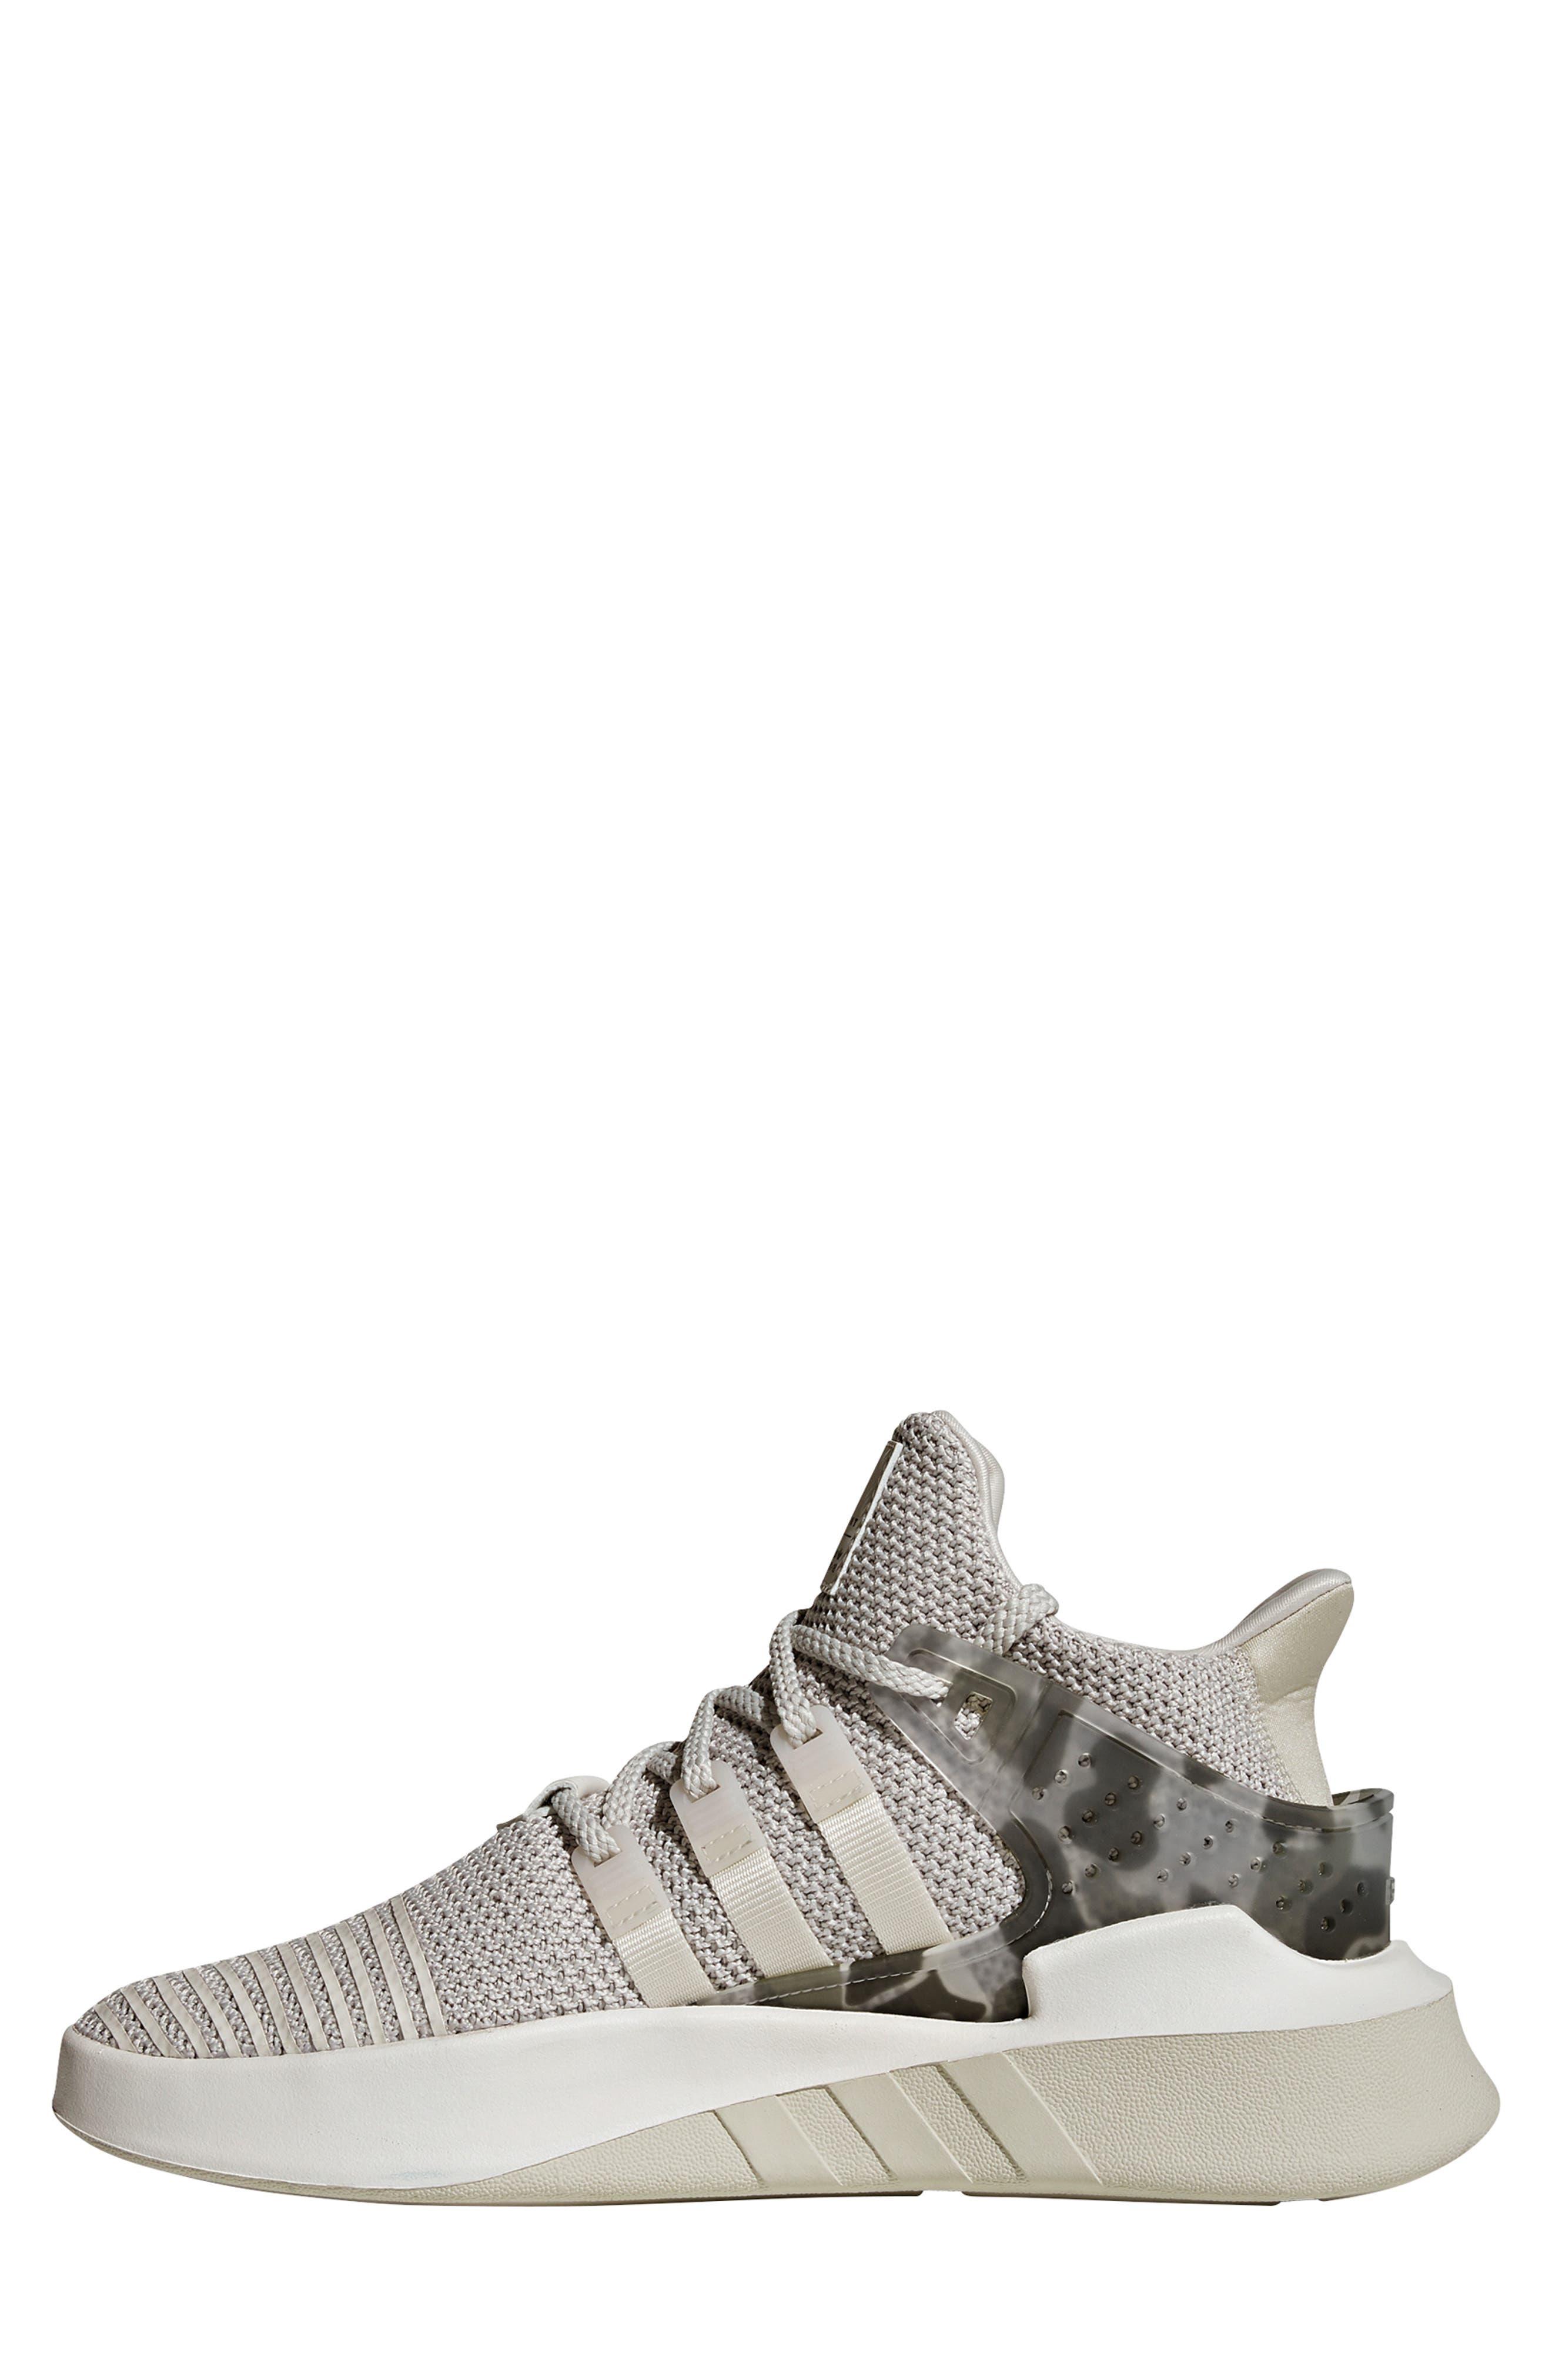 EQT Basketball ADV Sneaker,                             Alternate thumbnail 8, color,                             GREY/ CHALK WHITE